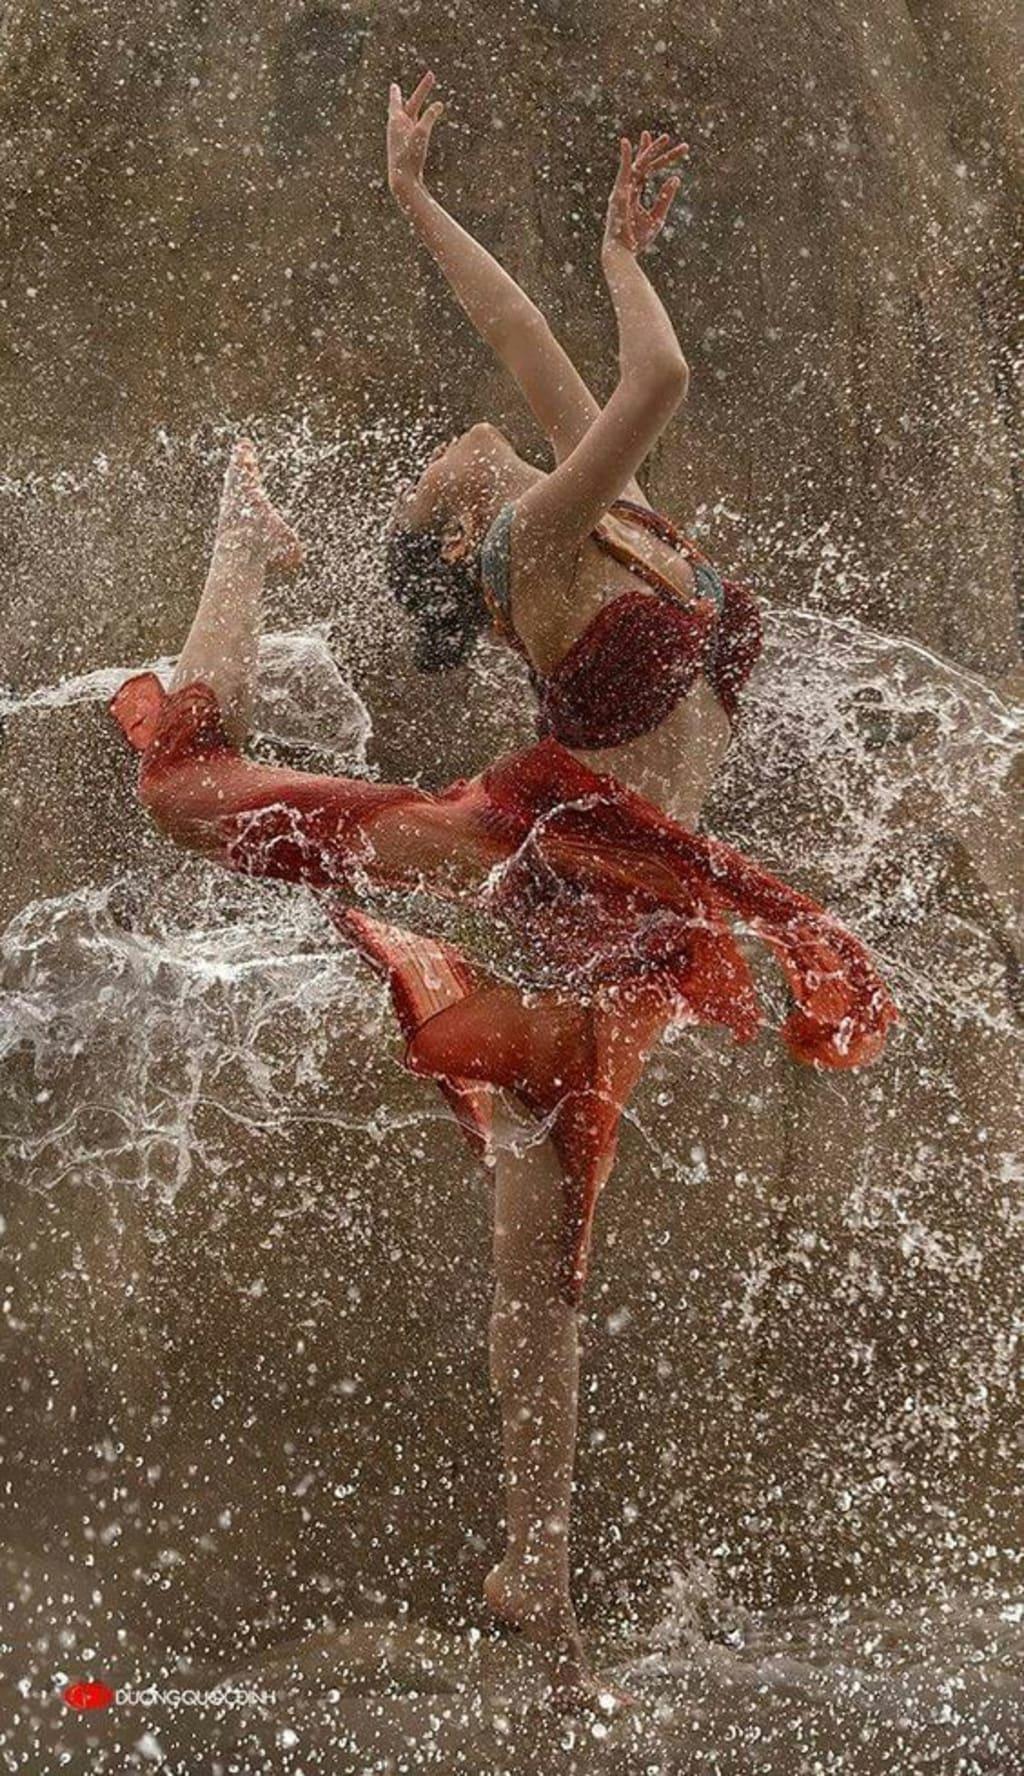 Dancing Alone in the Rain